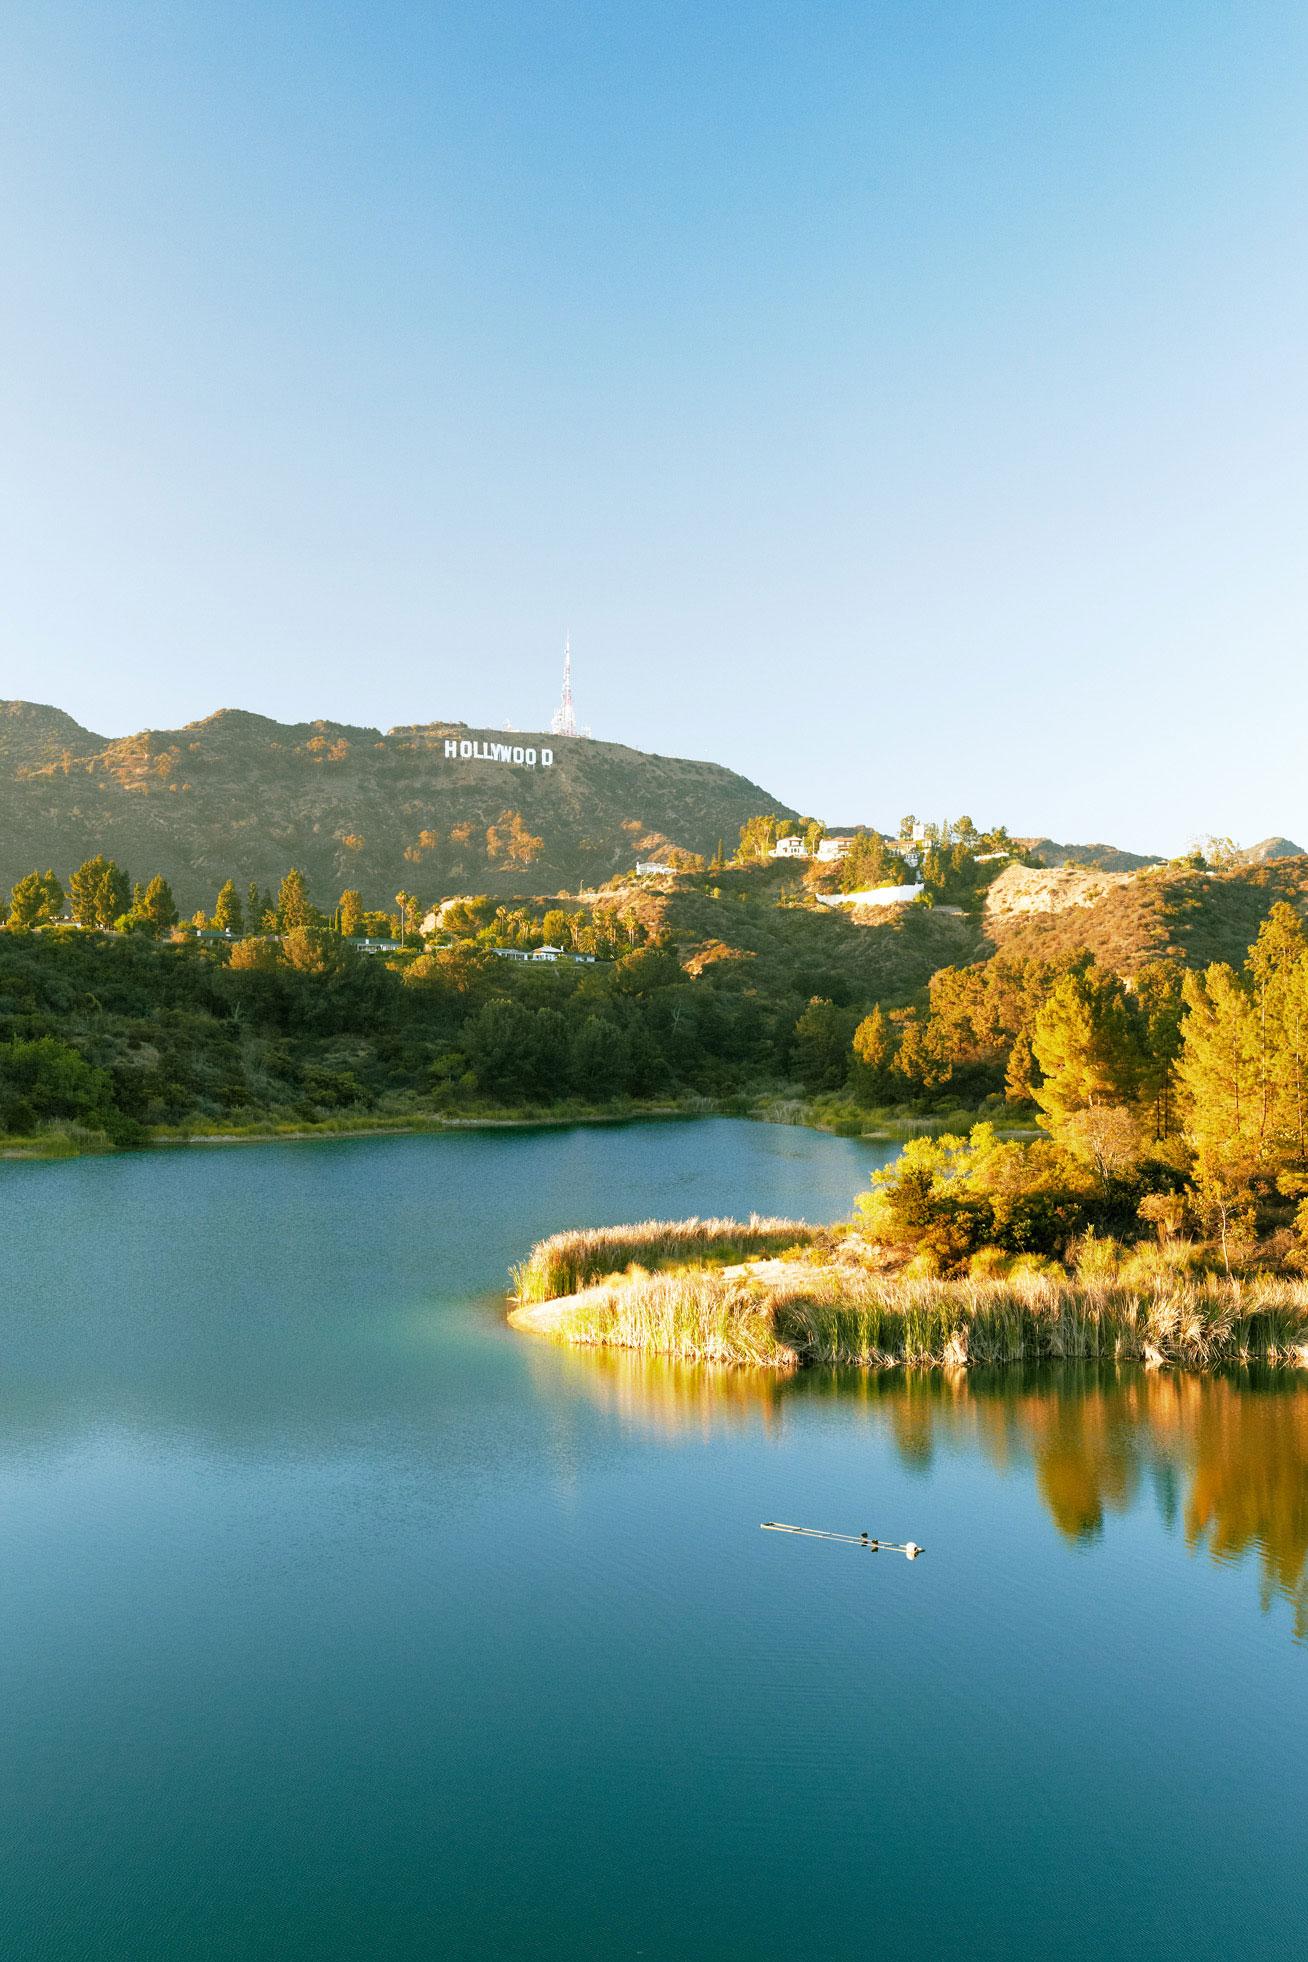 Lake Hollywood Reservoir Walking Trail